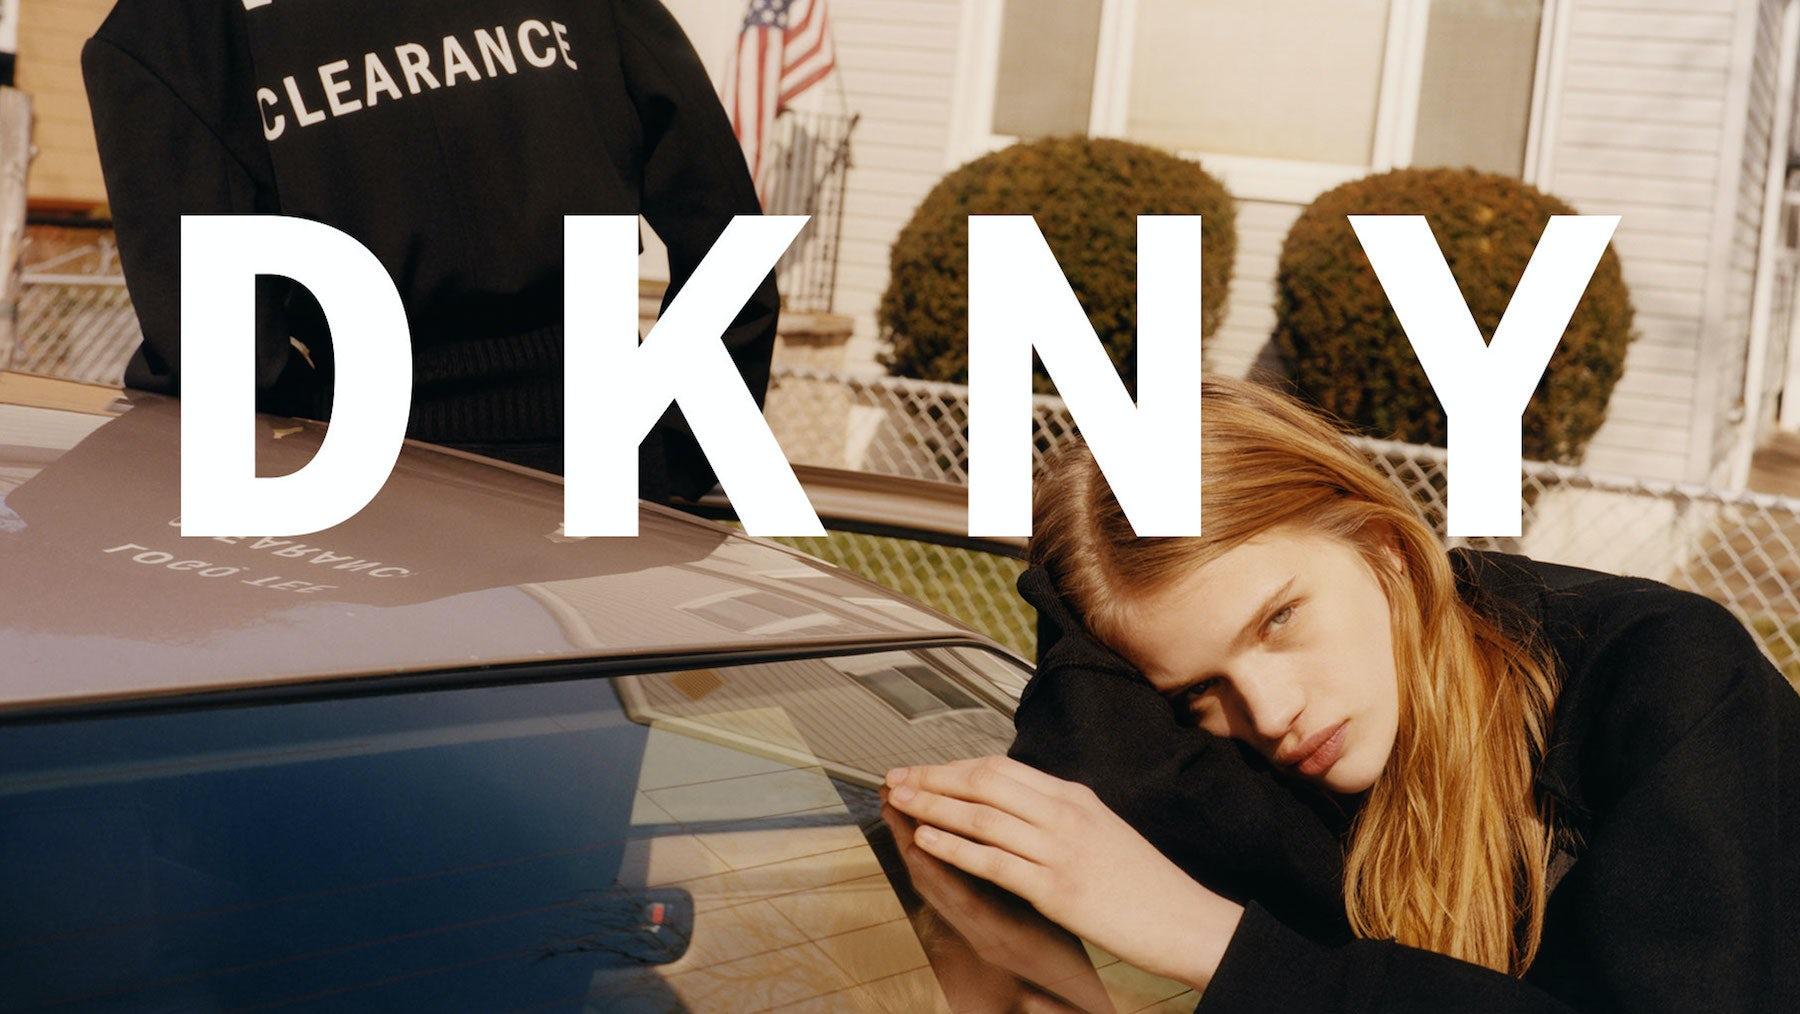 DKNY Autumn/Winter 2016 | Source: DKNY